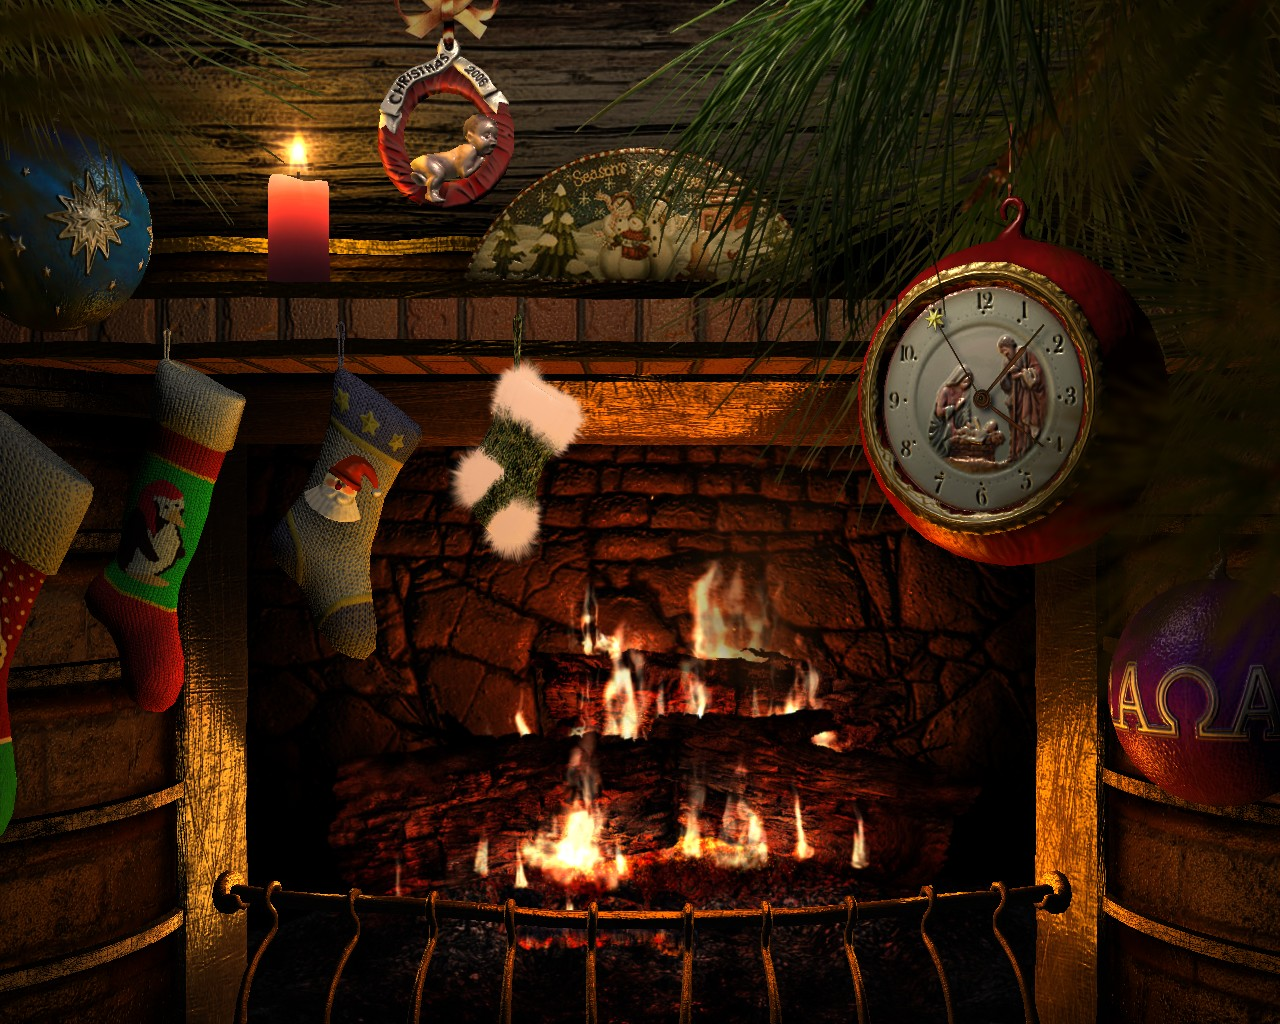 christmas pour windows tlcharger 3planesoft christmas pour windows 1280x1024